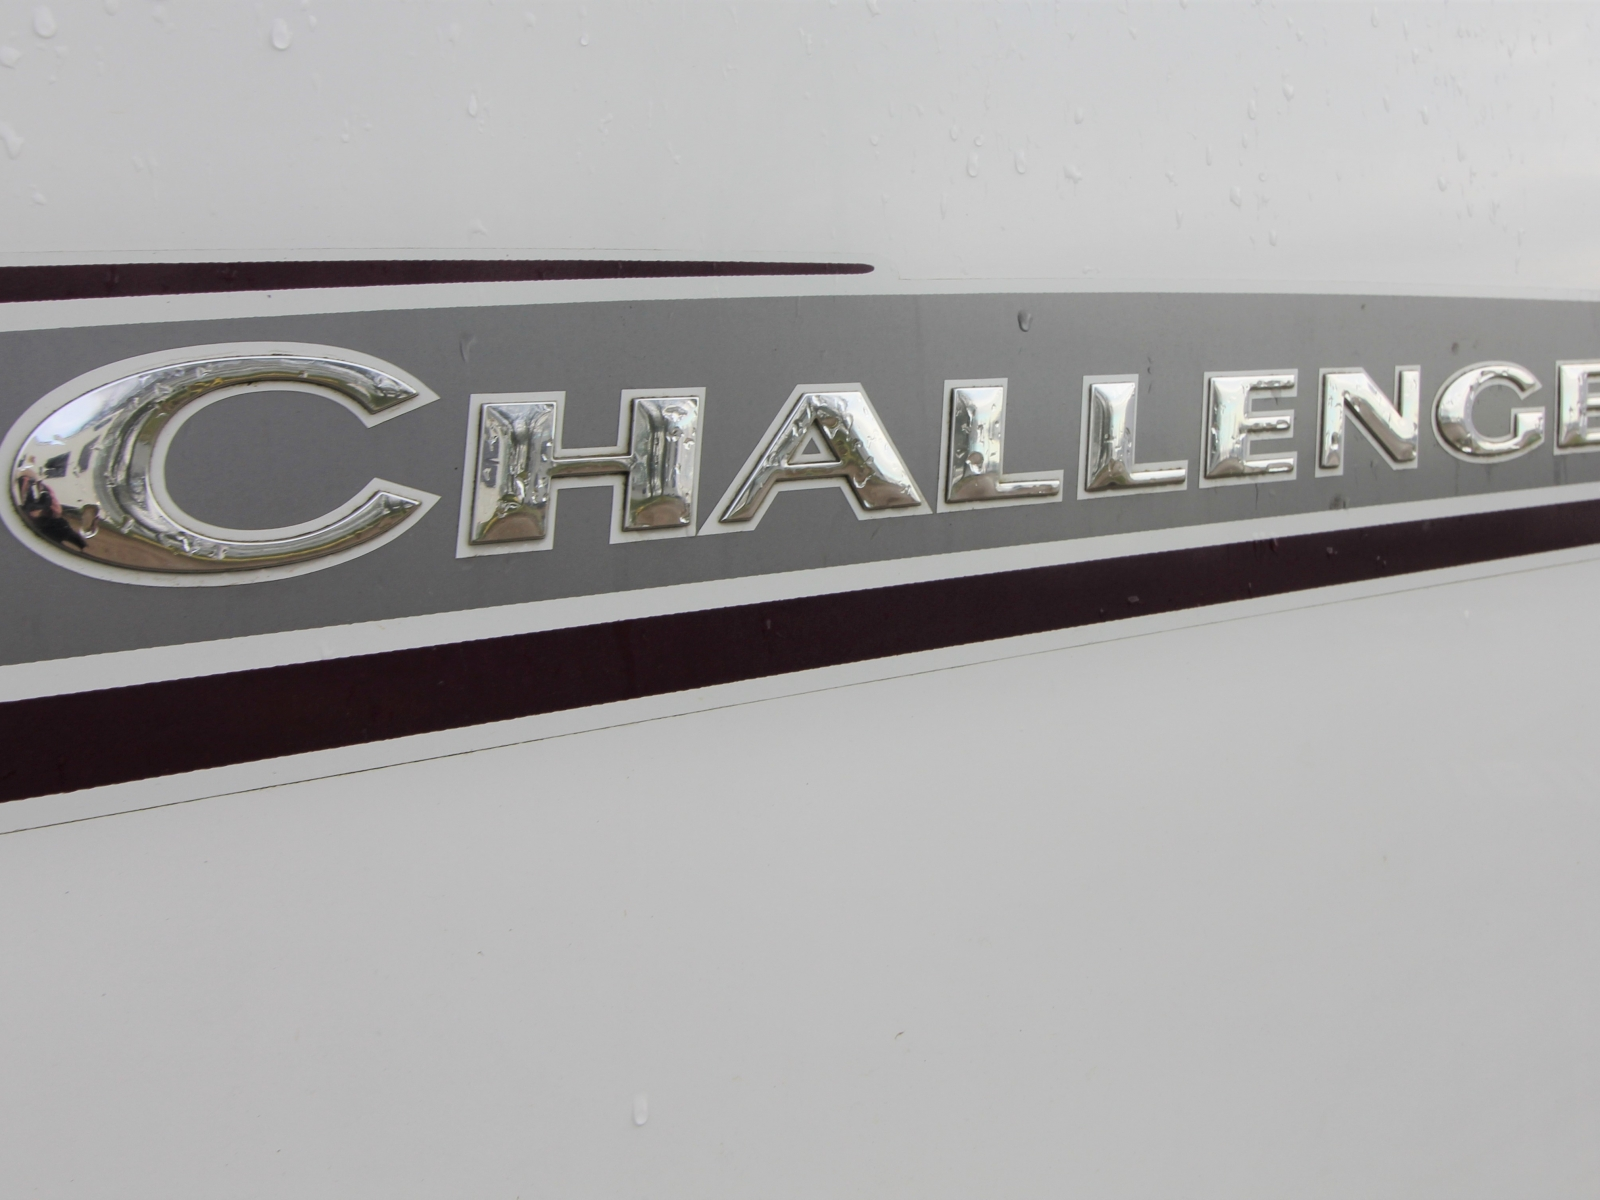 Swift Challenger 480 2007 image